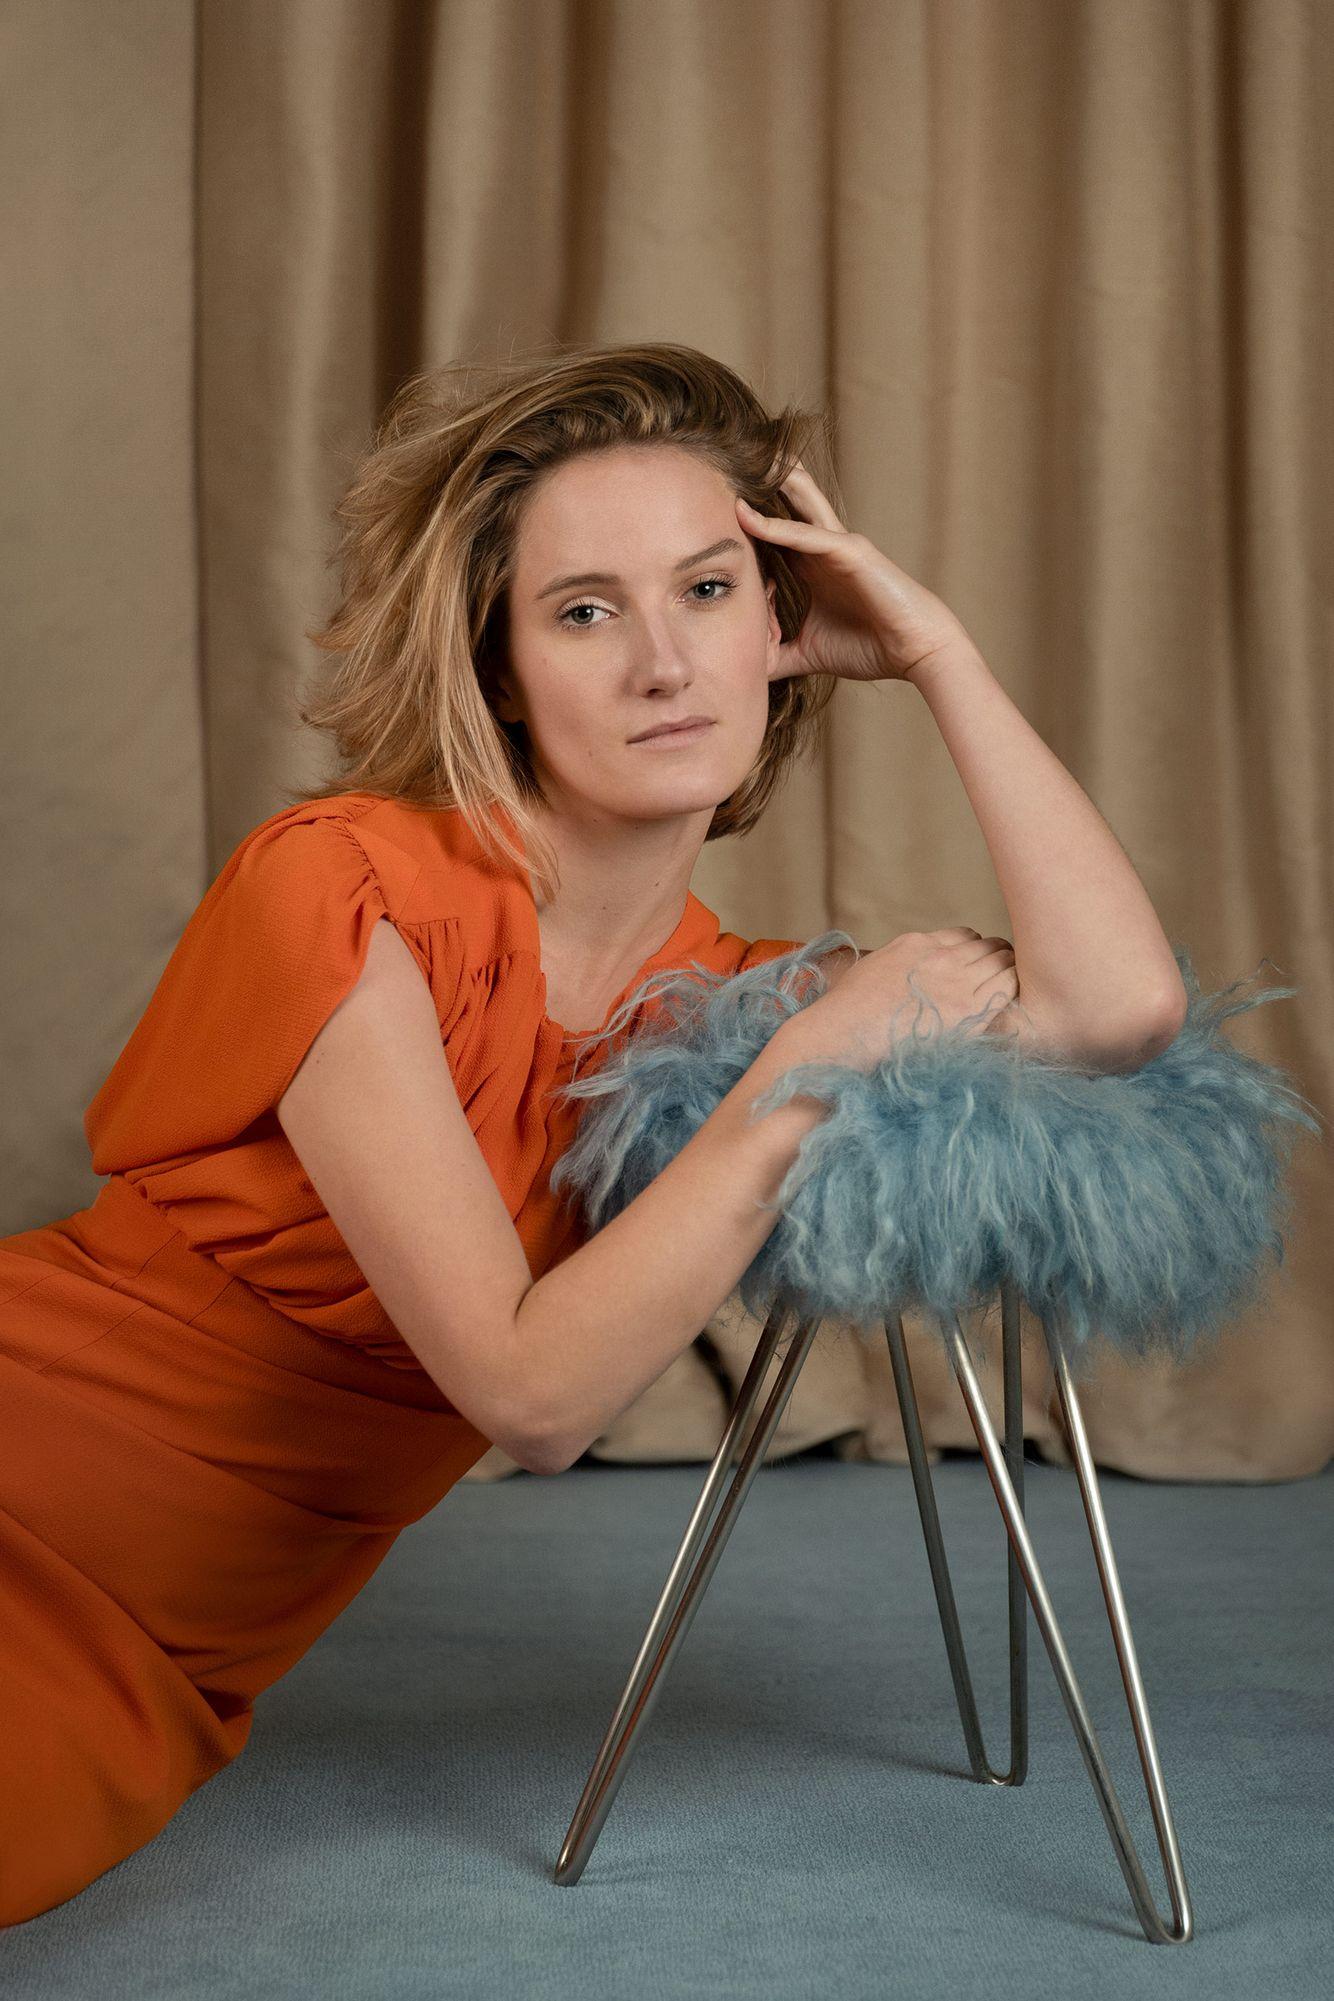 Actress Allegra Marland